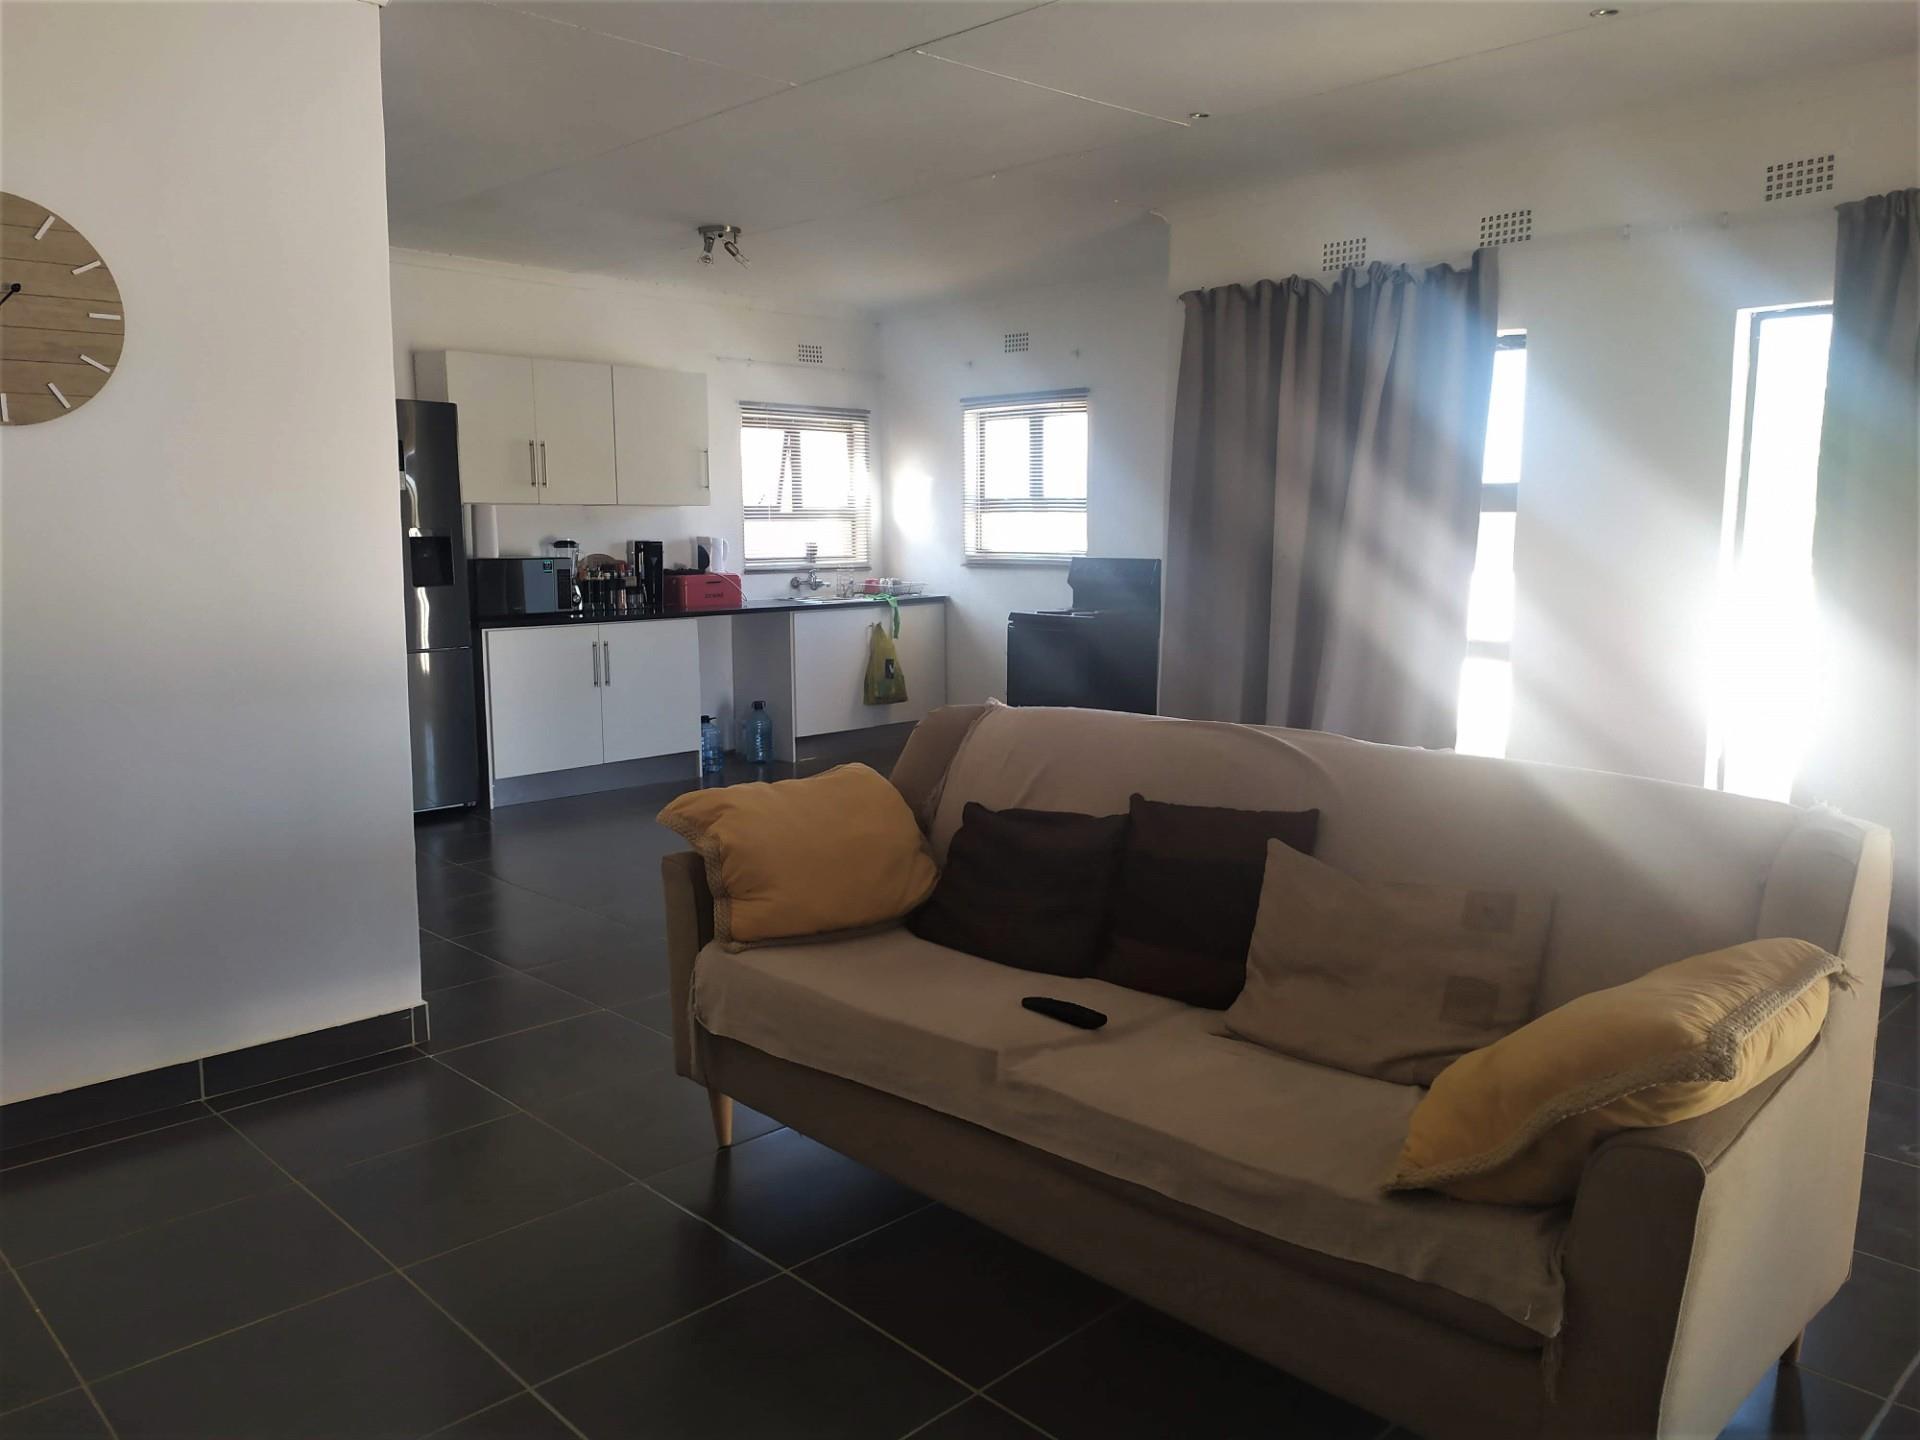 3 Bedroom House For Sale in Rasesa